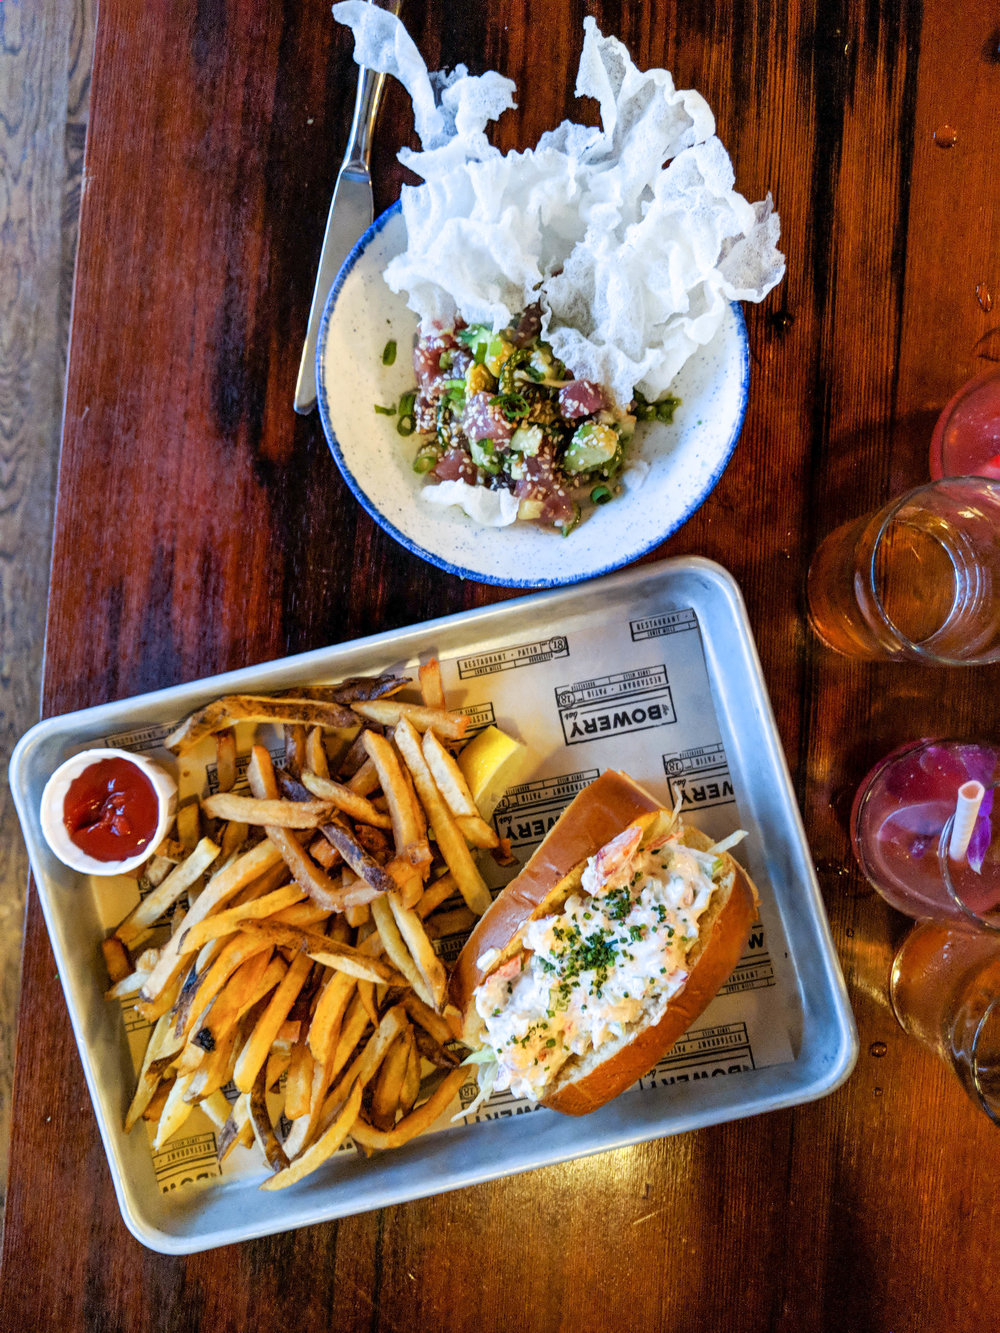 bri rinehart; photography; food; the bowery